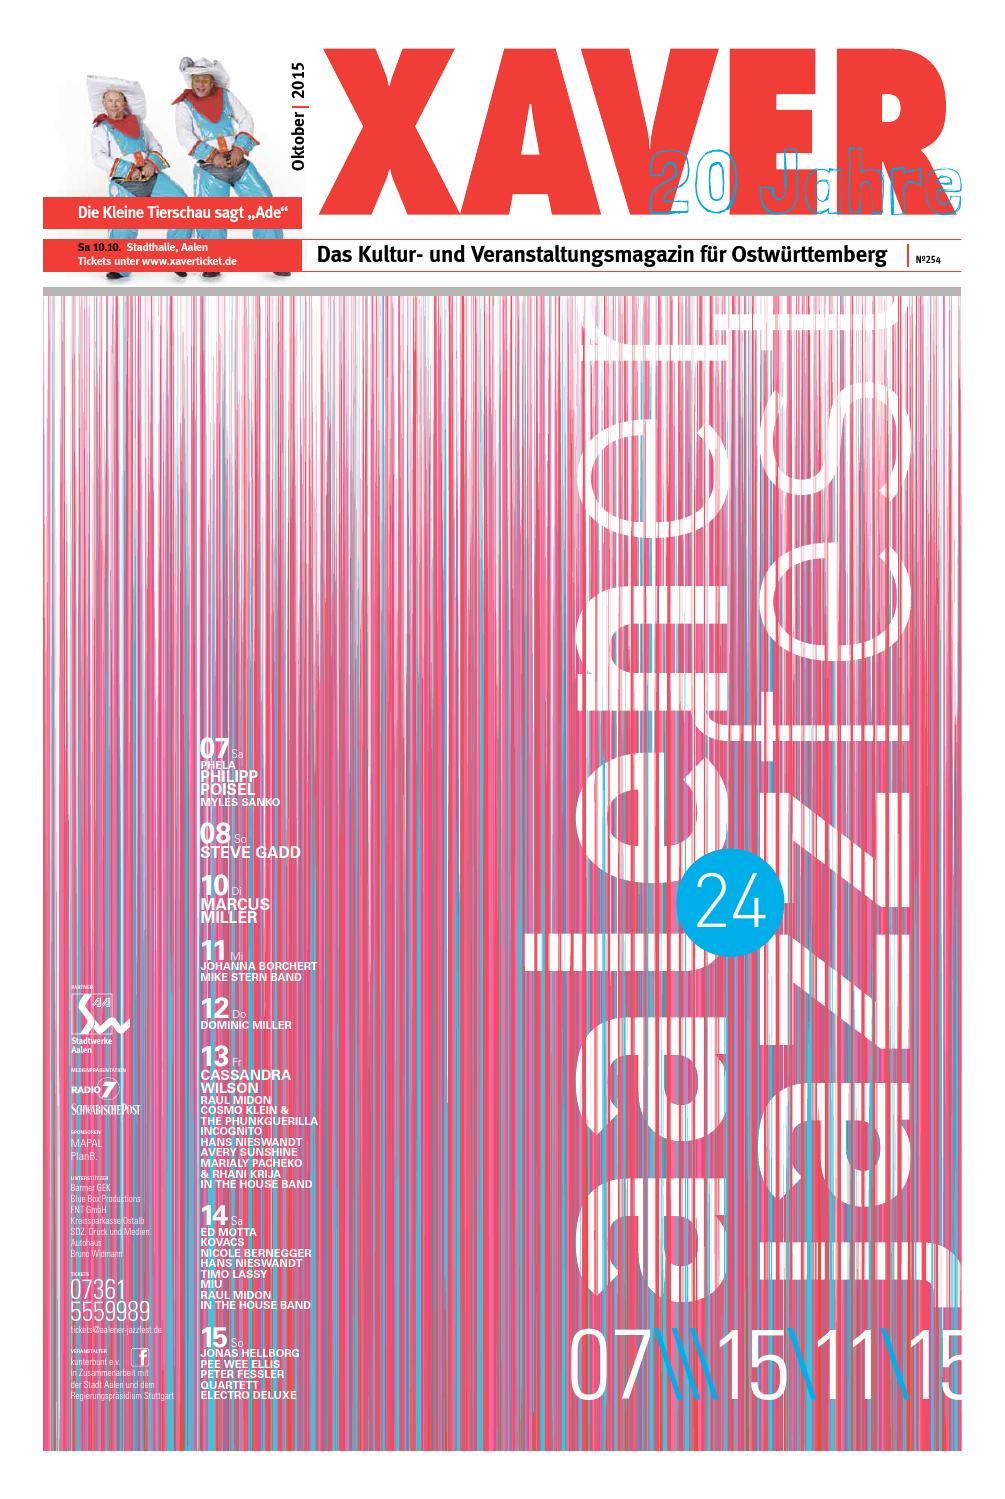 XAVER 10 | 2015 by Hariolf Erhardt - issuu